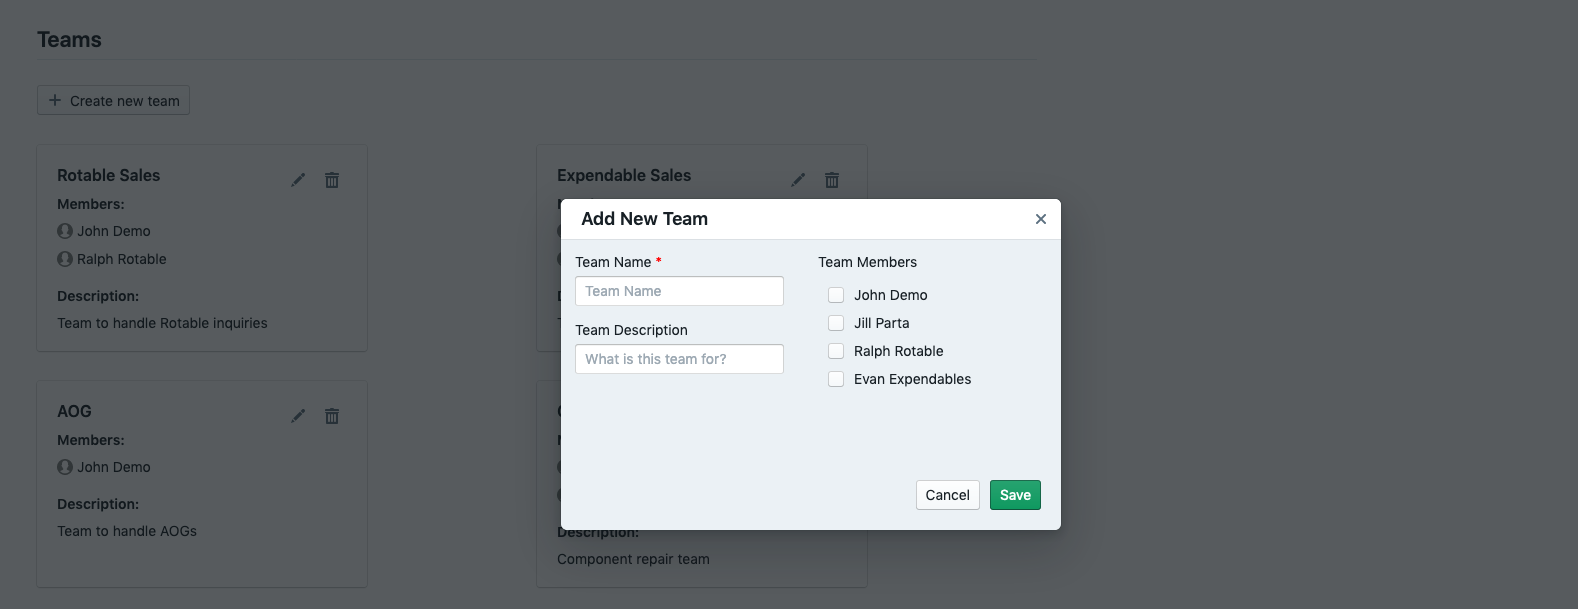 Adding a new team